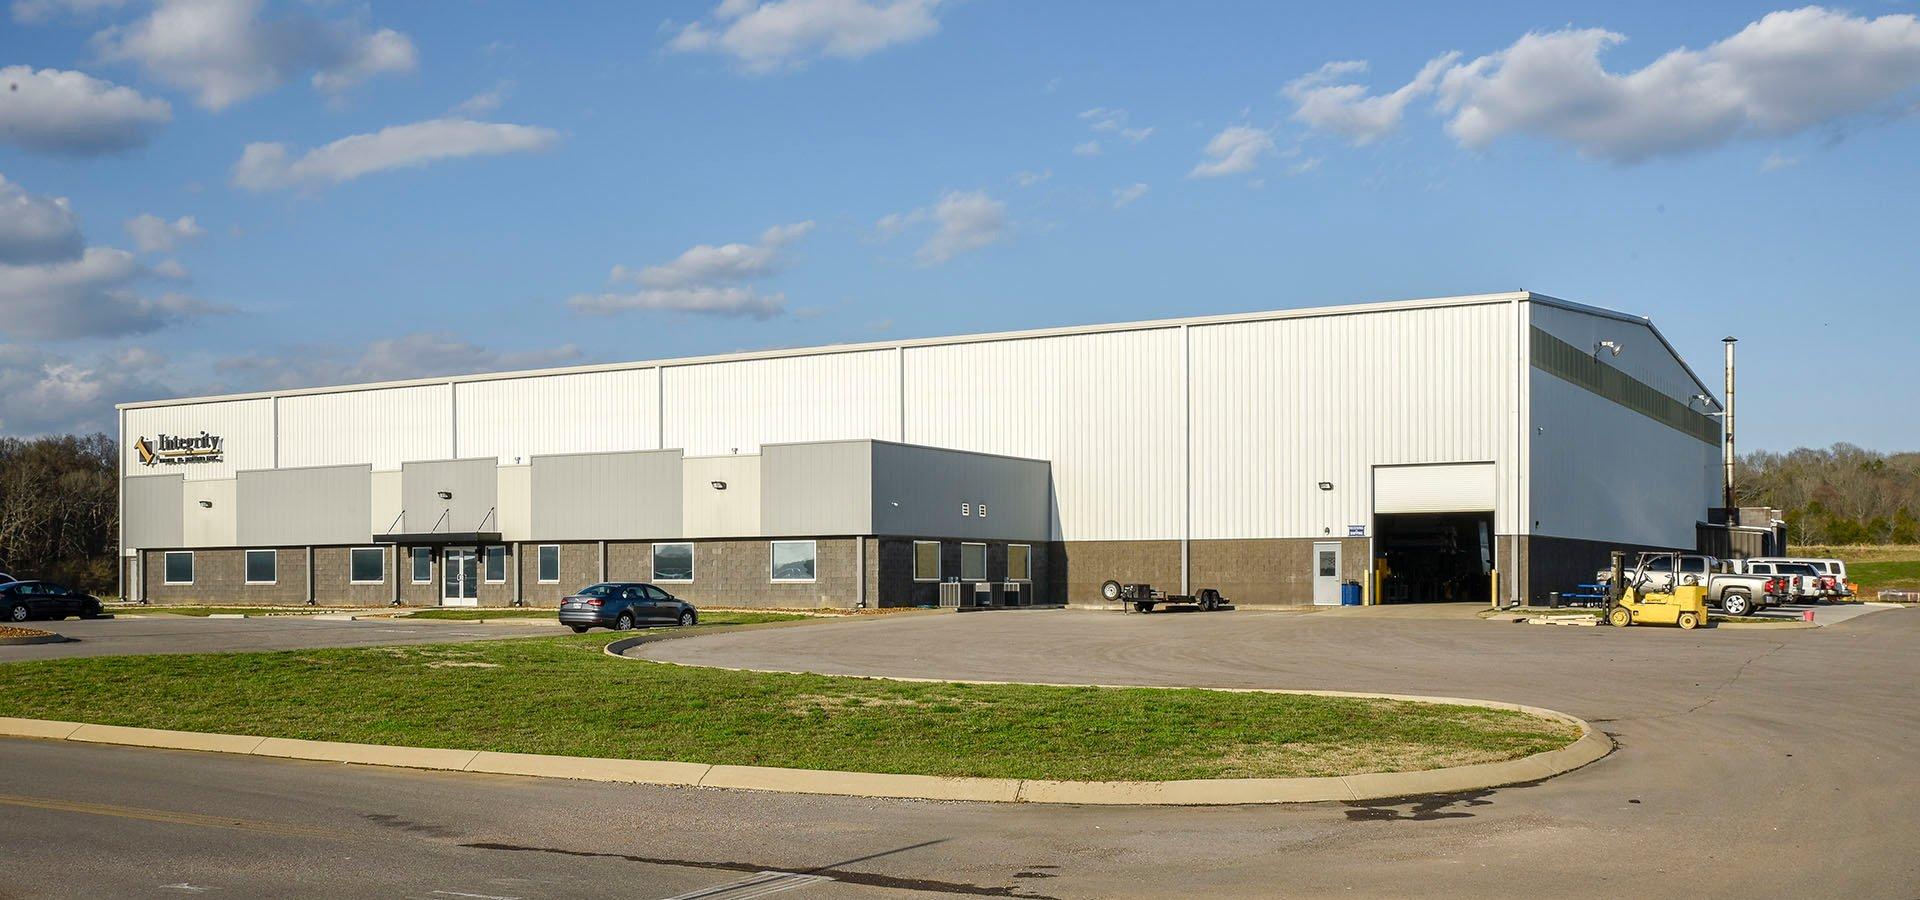 Integrity Tool & Mold Inc. | Pulaski, Tennessee | Brindley Construction, LLC.